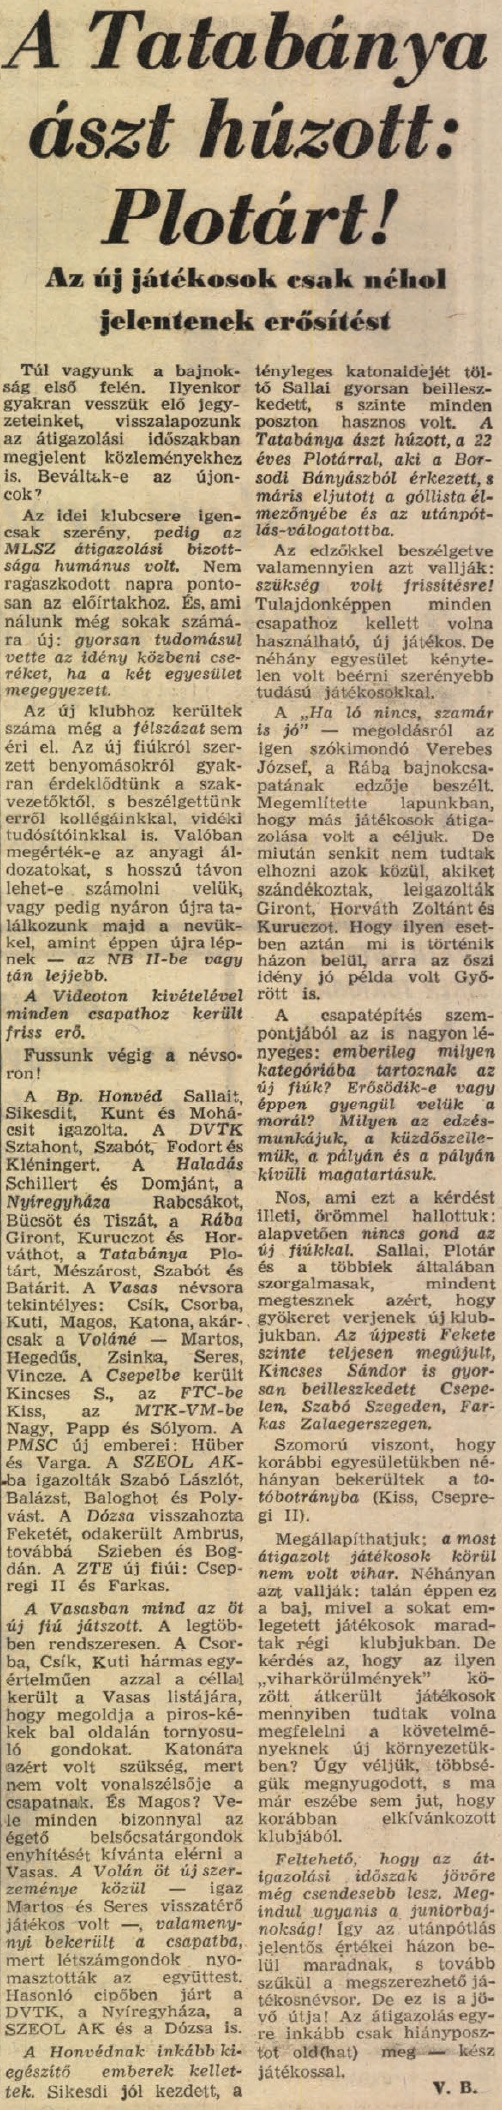 idokapszula_nb_i_1983_84_oszi_zaras_statisztikak_plotar_gyula.jpg